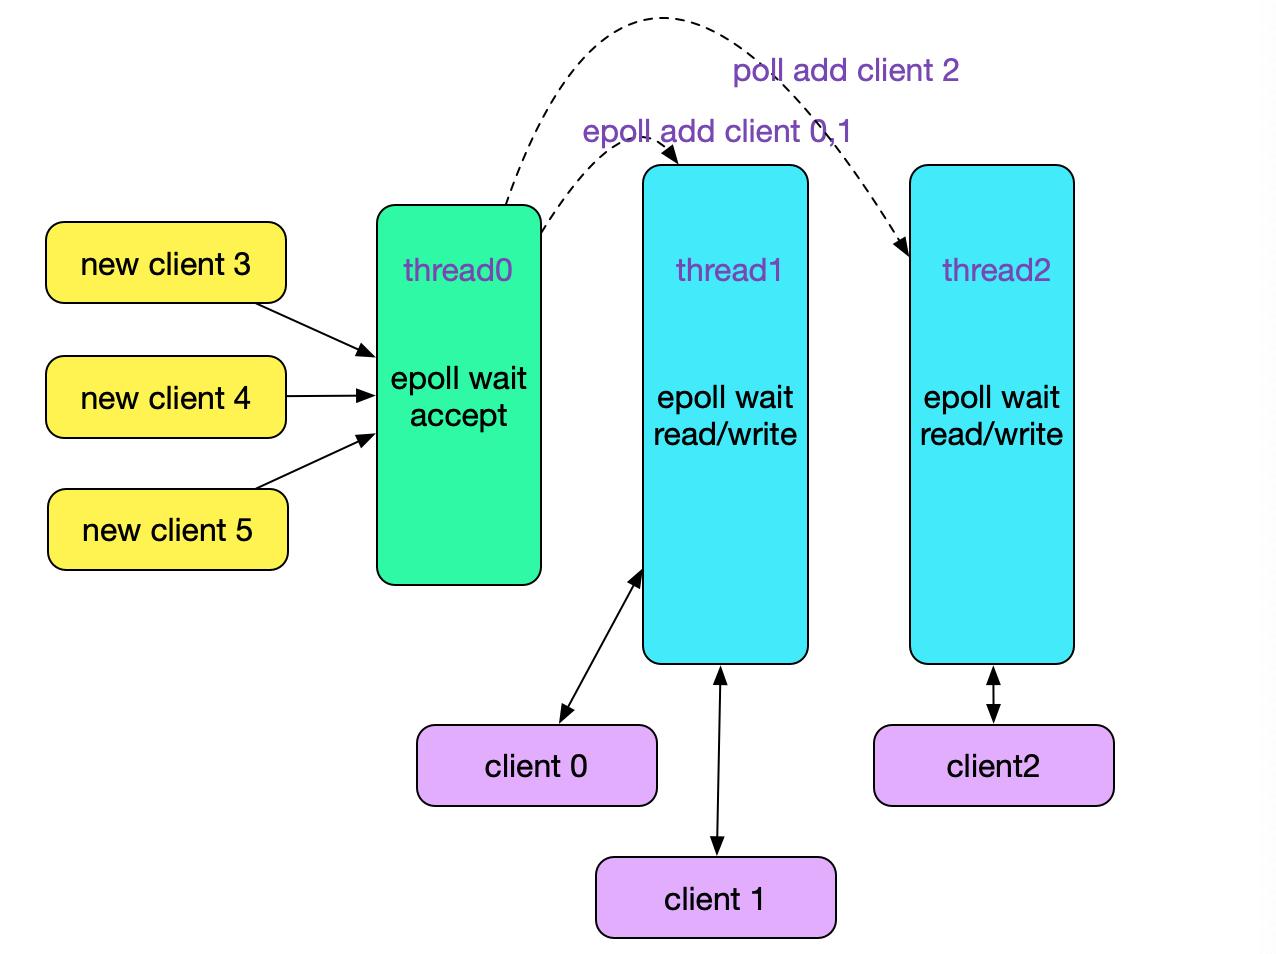 up a1a9d031f9d0c3c05f898f8dea3b53f4c11 - 从Linux源码看Socket(TCP)的bind